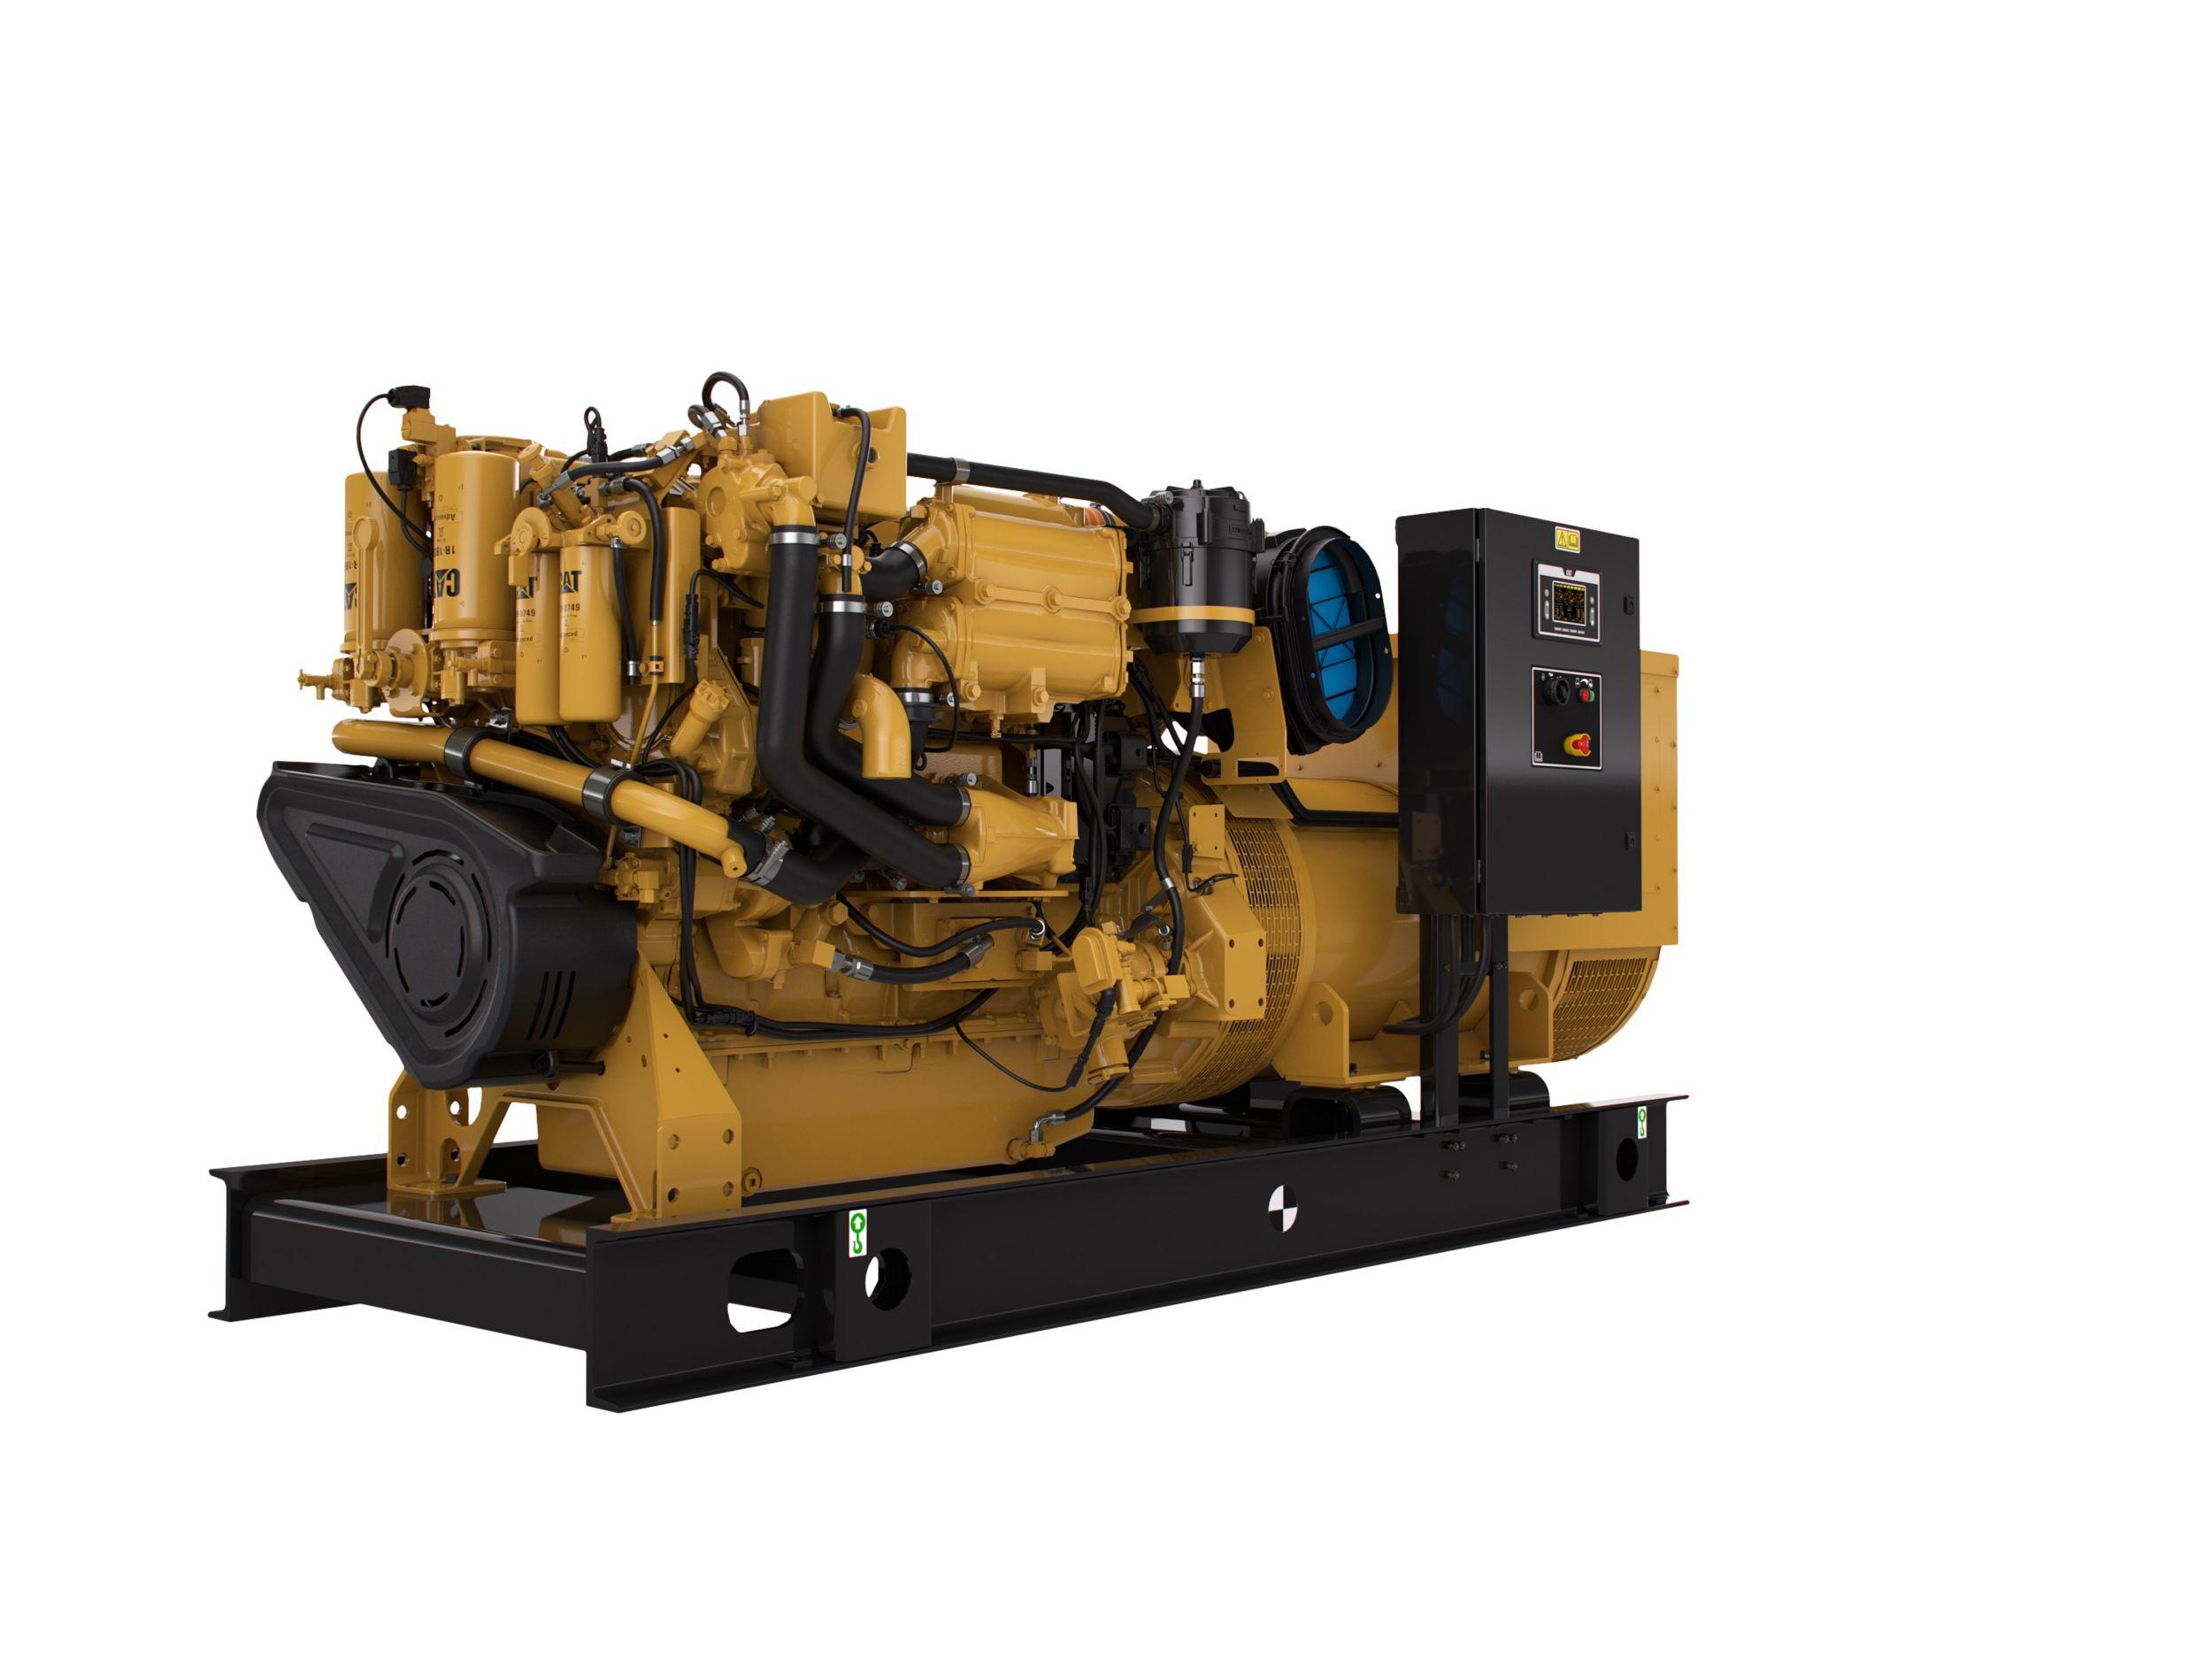 C18 (SRMP) Marine Generator Set